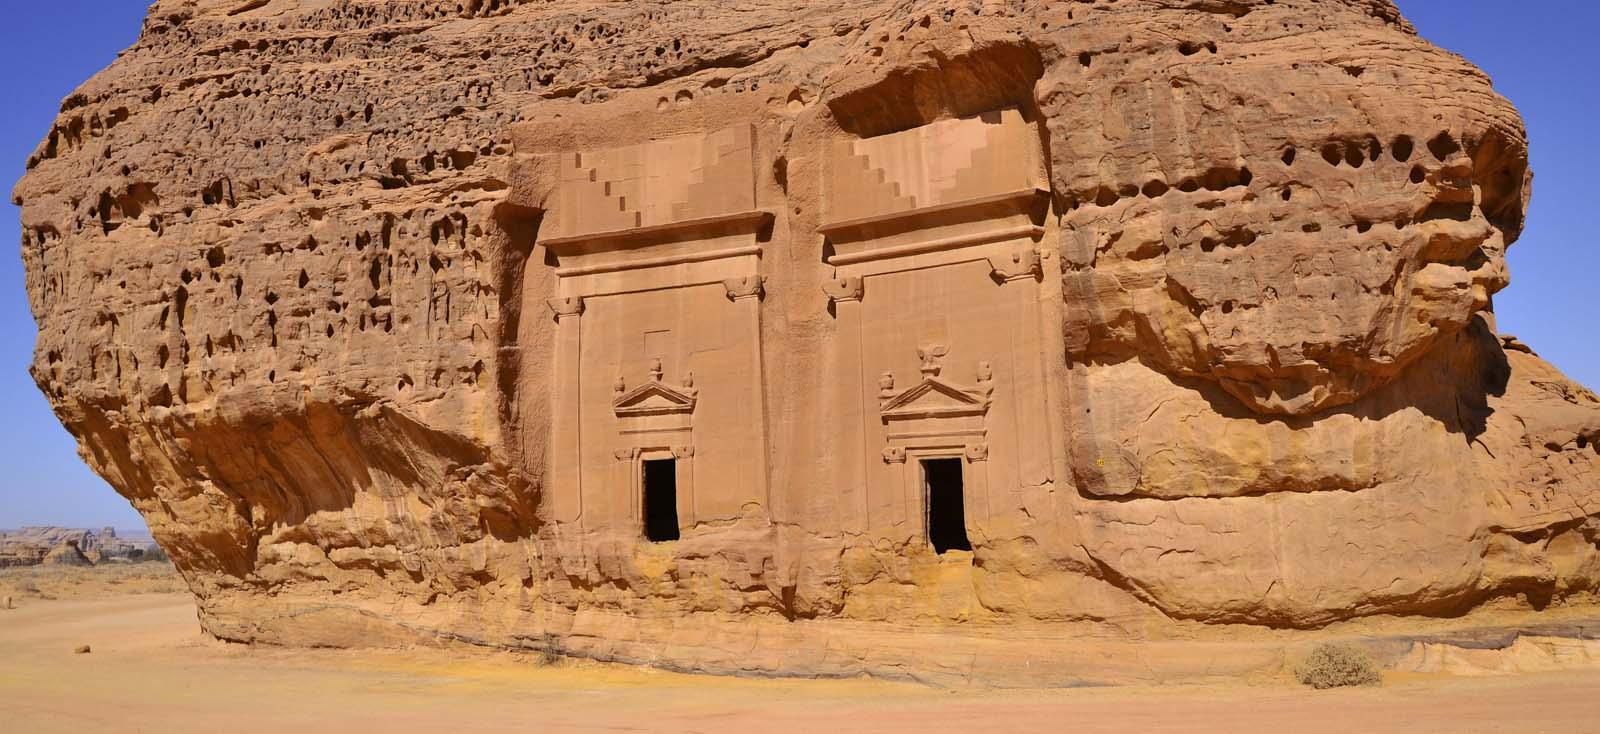 Totenstadt in Saudi Arabien Mada'in Salih